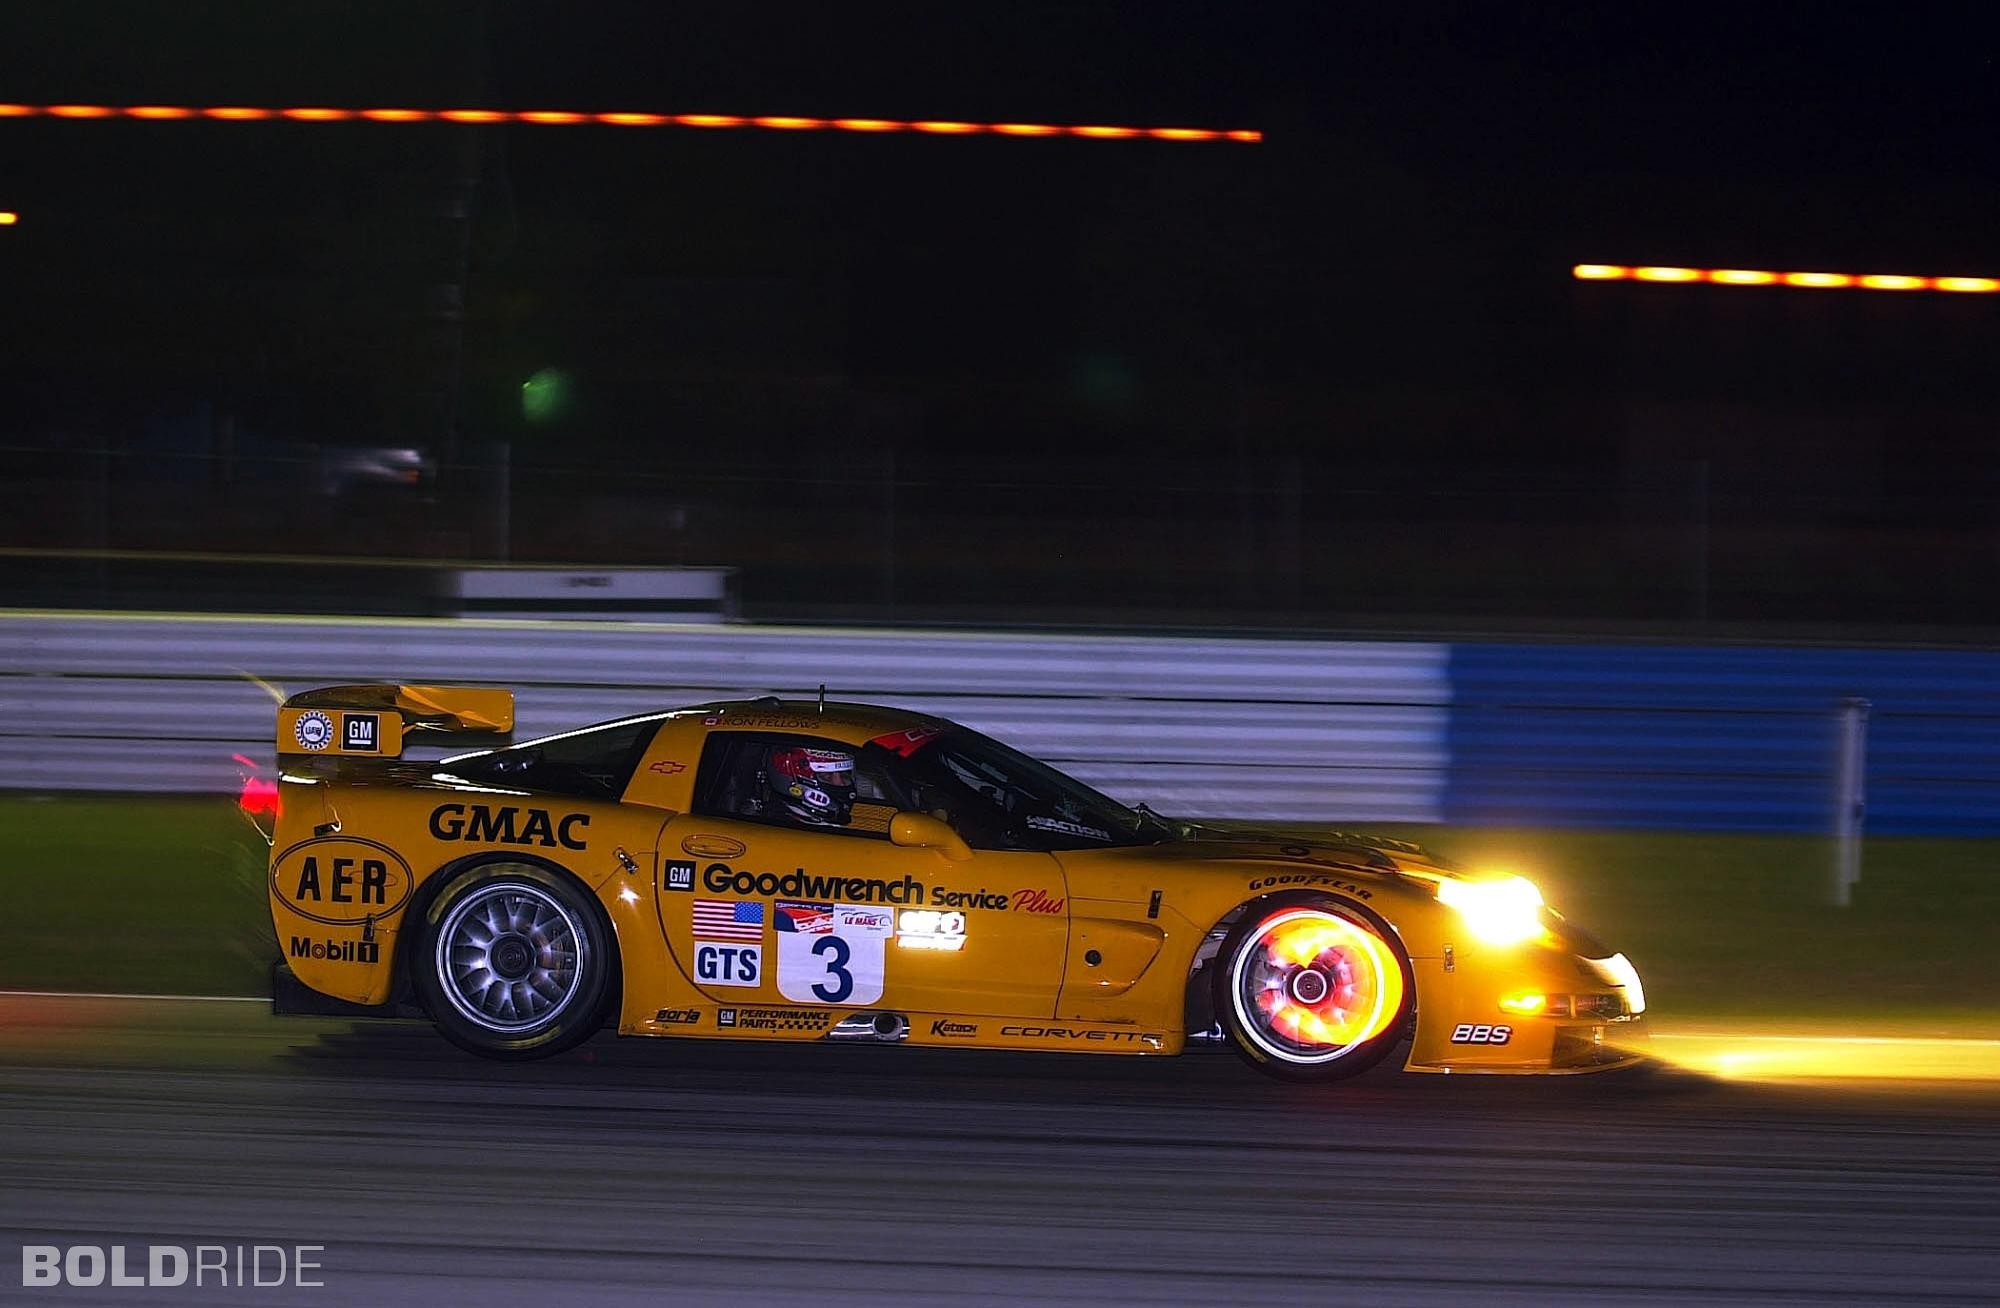 Corvette C5 R supercar supercars race racing j wallpaper background 2000x1308